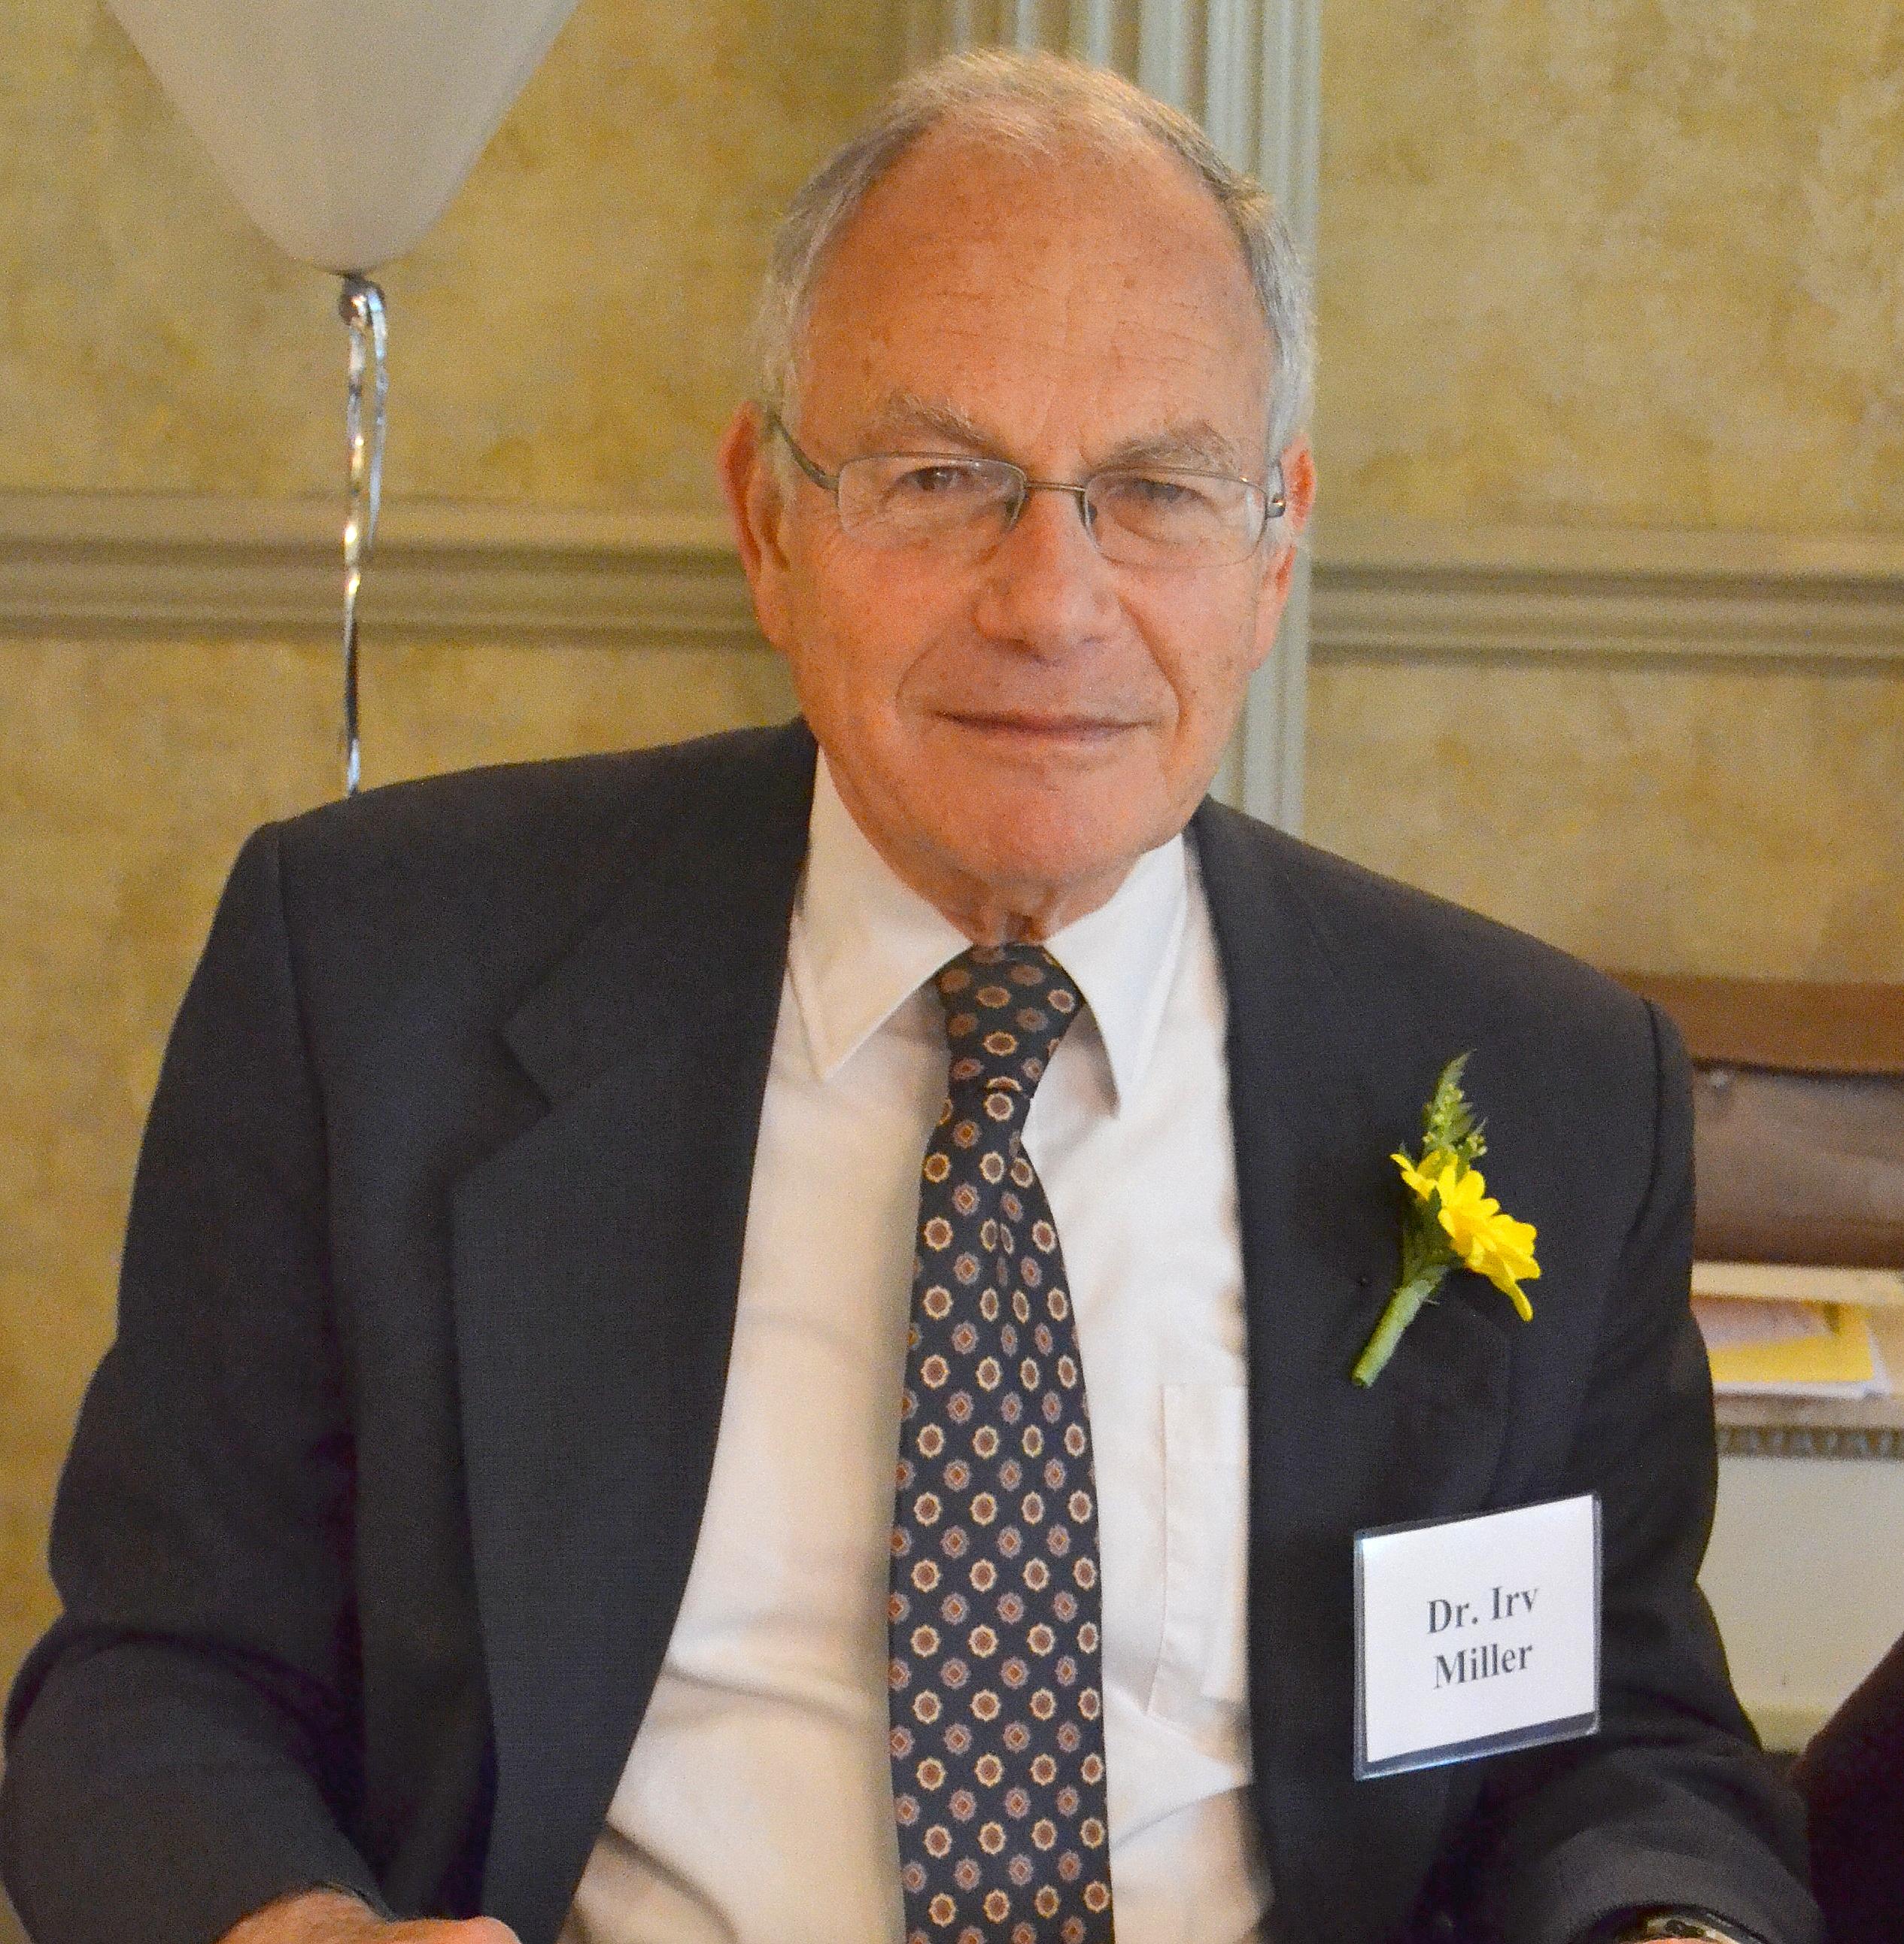 Dr. Irv Miller - 2016 Male Senior Citizen of the Year